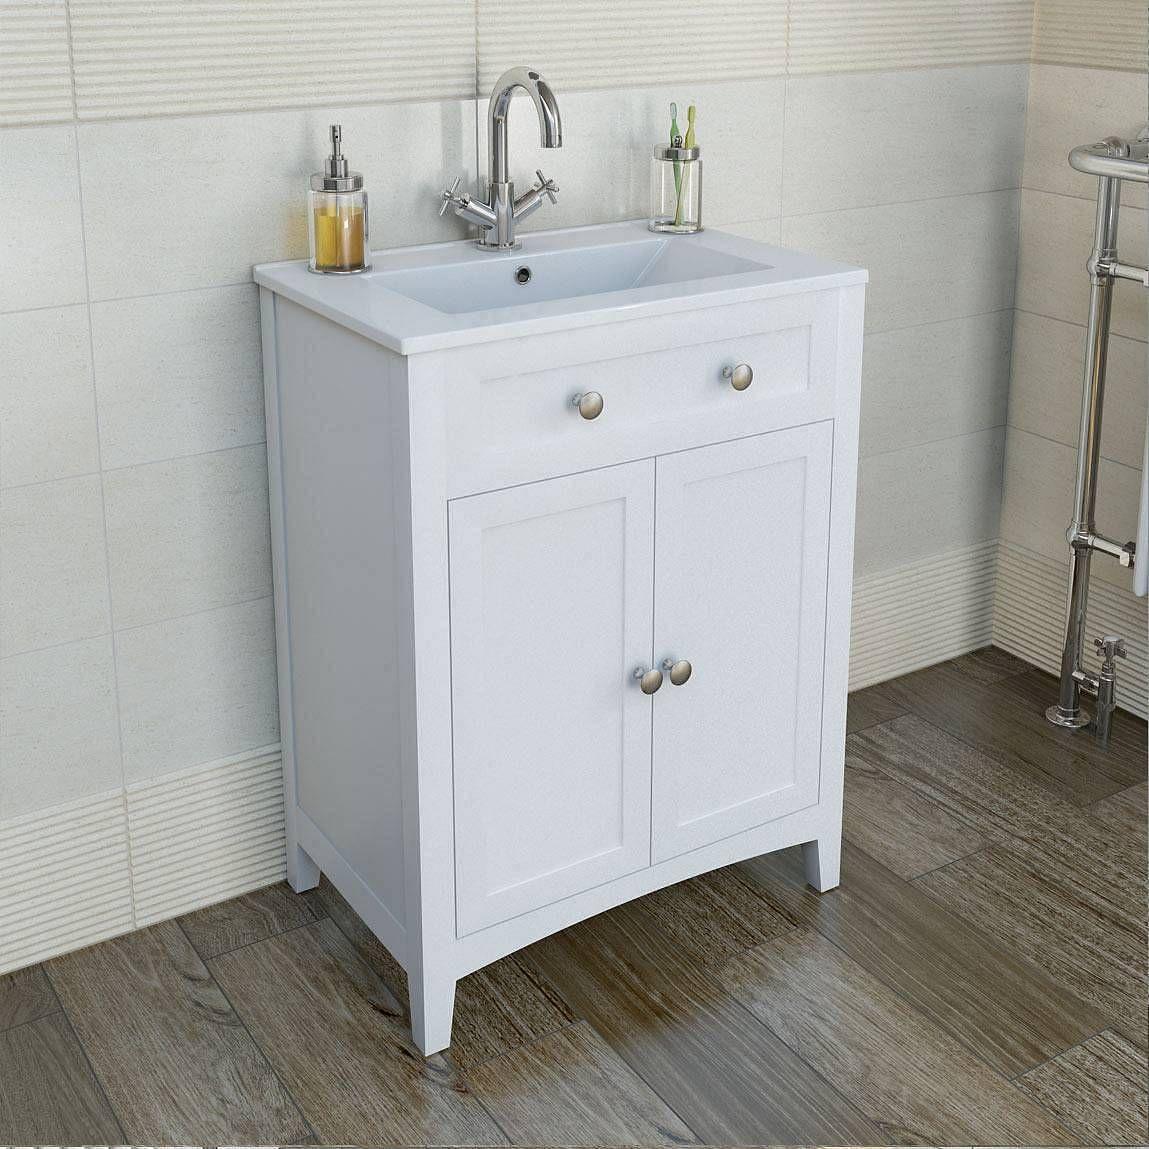 Camberley White Furniture Unit Basin Inc Alexa Mixer Tap Victoria Plumb